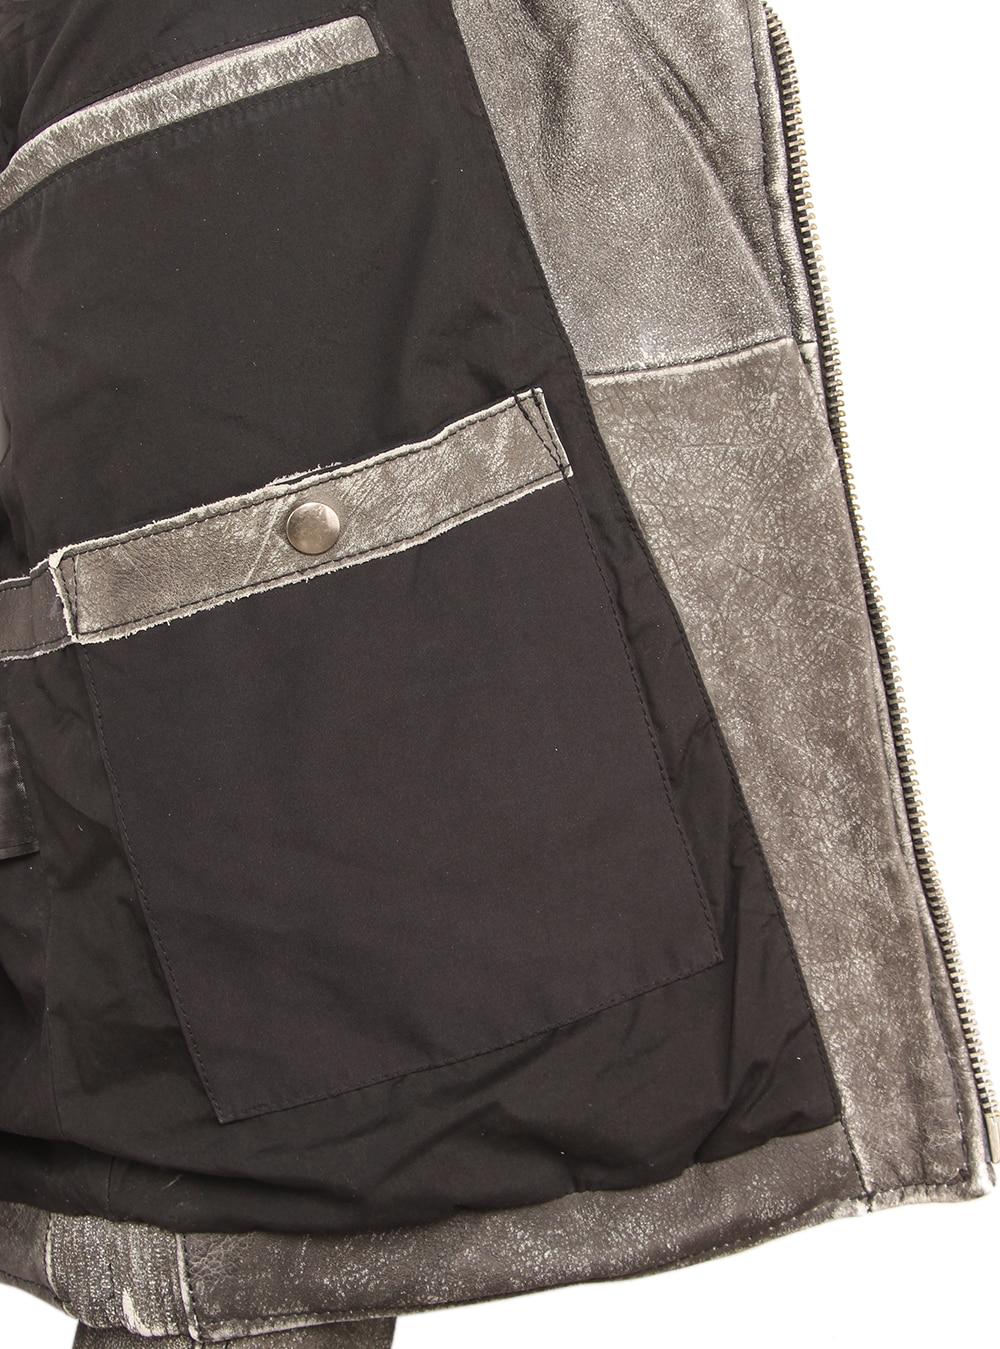 Hf1d1f121969d41c3ac50c4bba3a0b157z Vintage Motorcycle Jacket Slim Fit Thick Men Leather Jacket 100% Cowhide Moto Biker Jacket Man Leather Coat Winter Warm M455